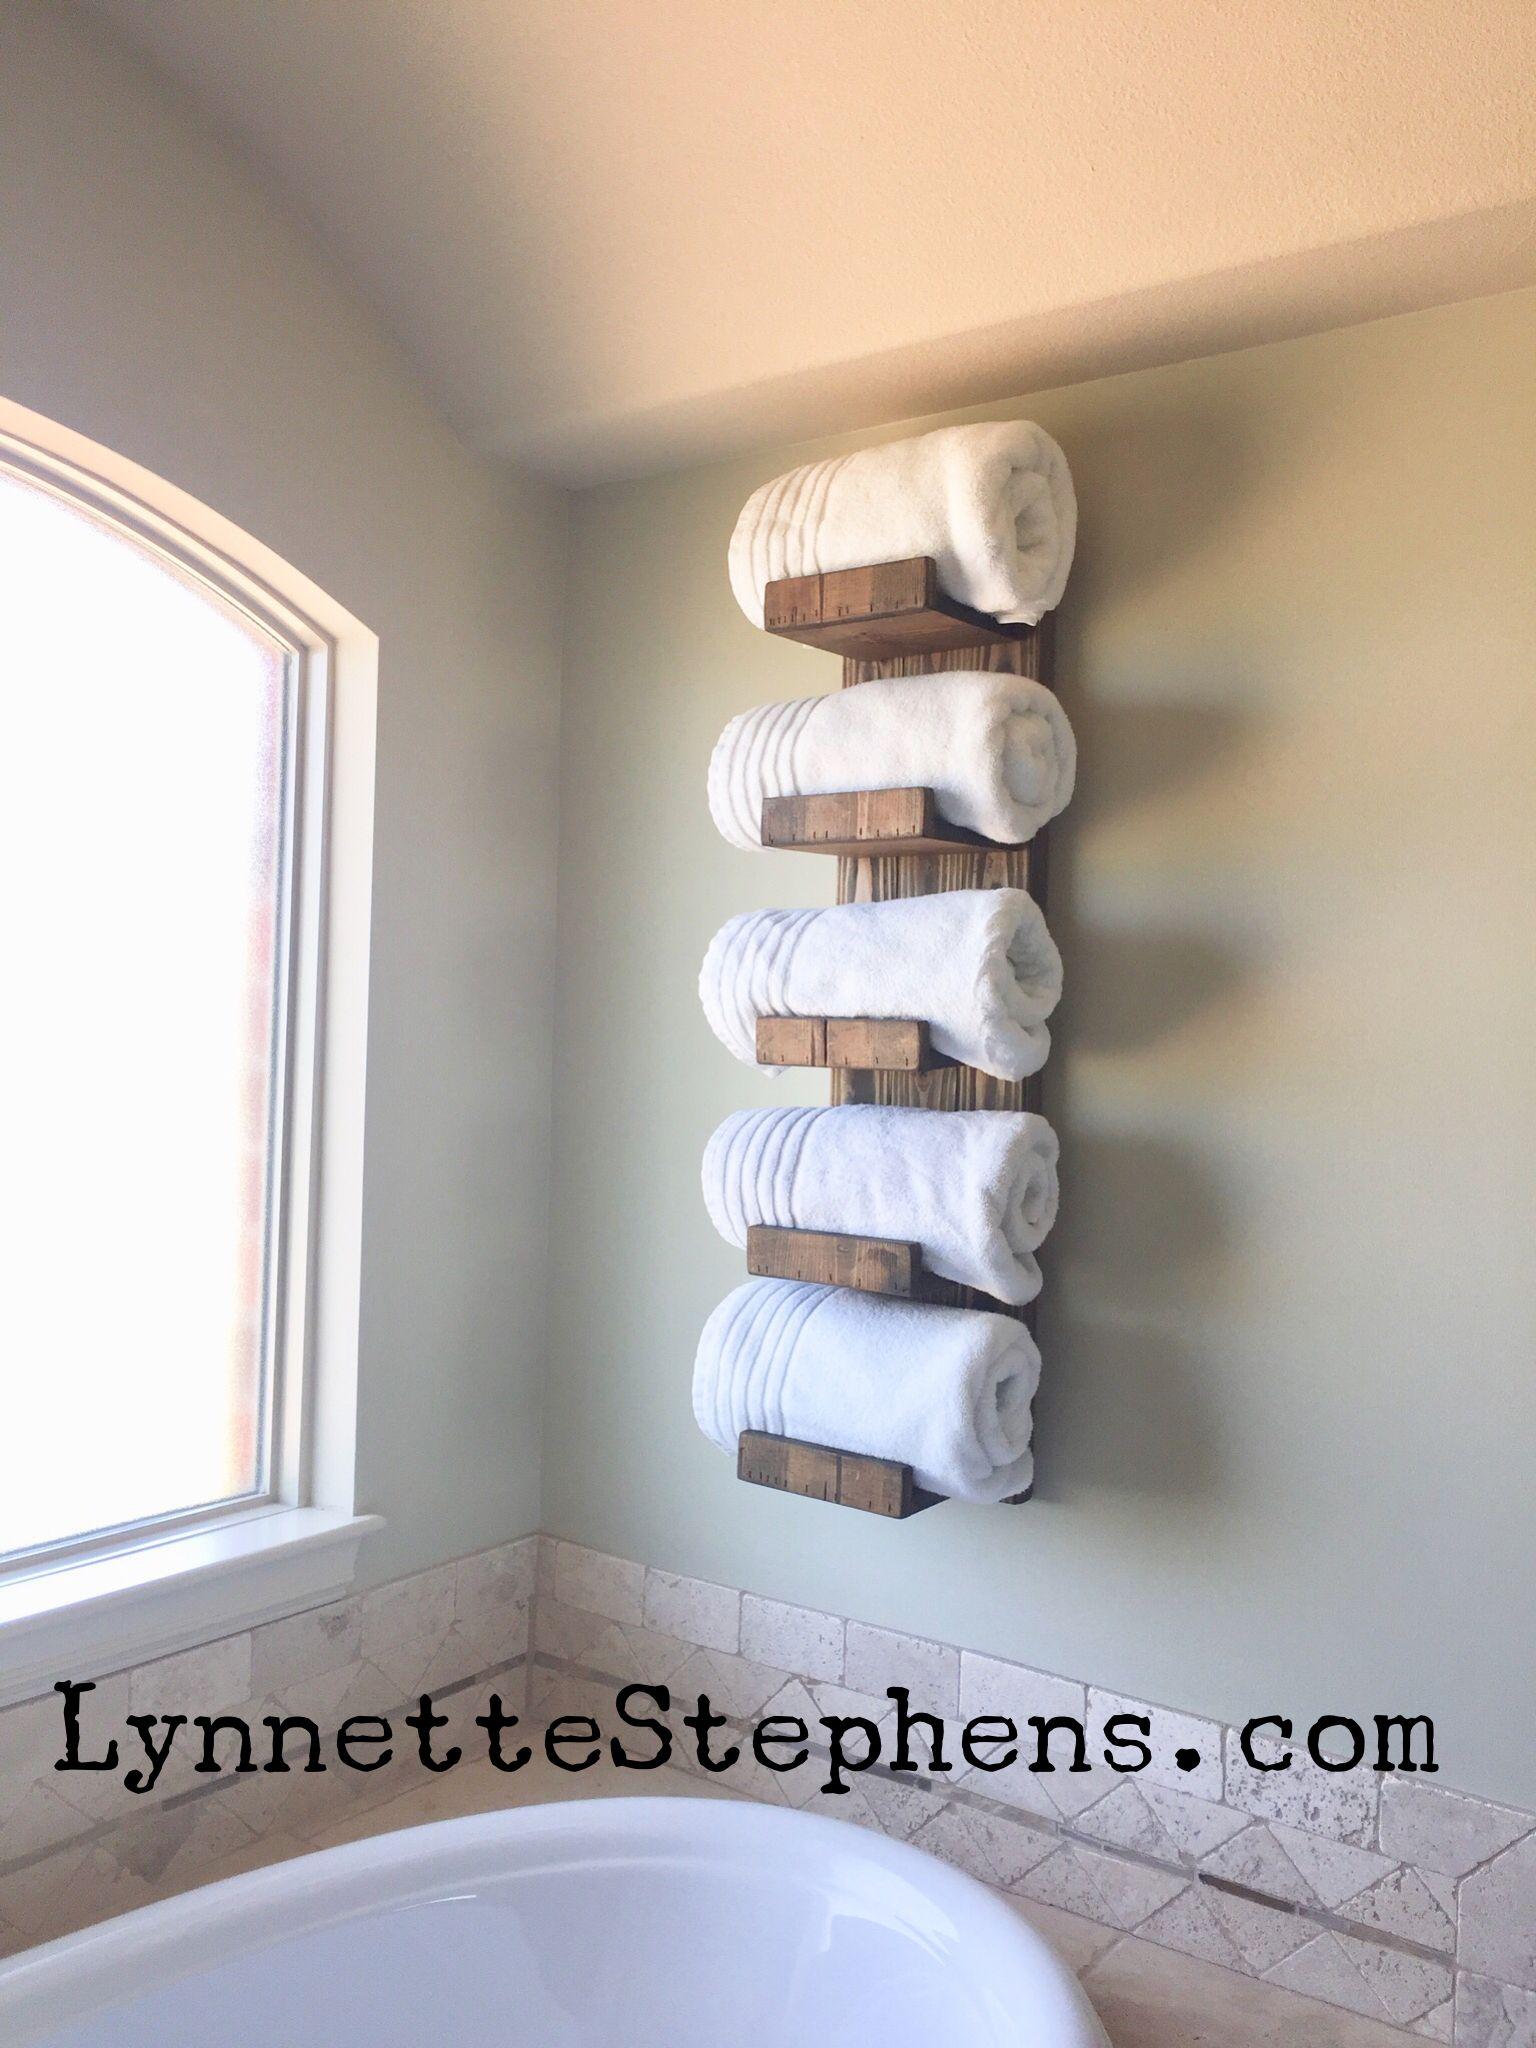 Wall Mounted Towel Holder Wall Mounted Towel Holder Wall Towel Holders Rustic Towels